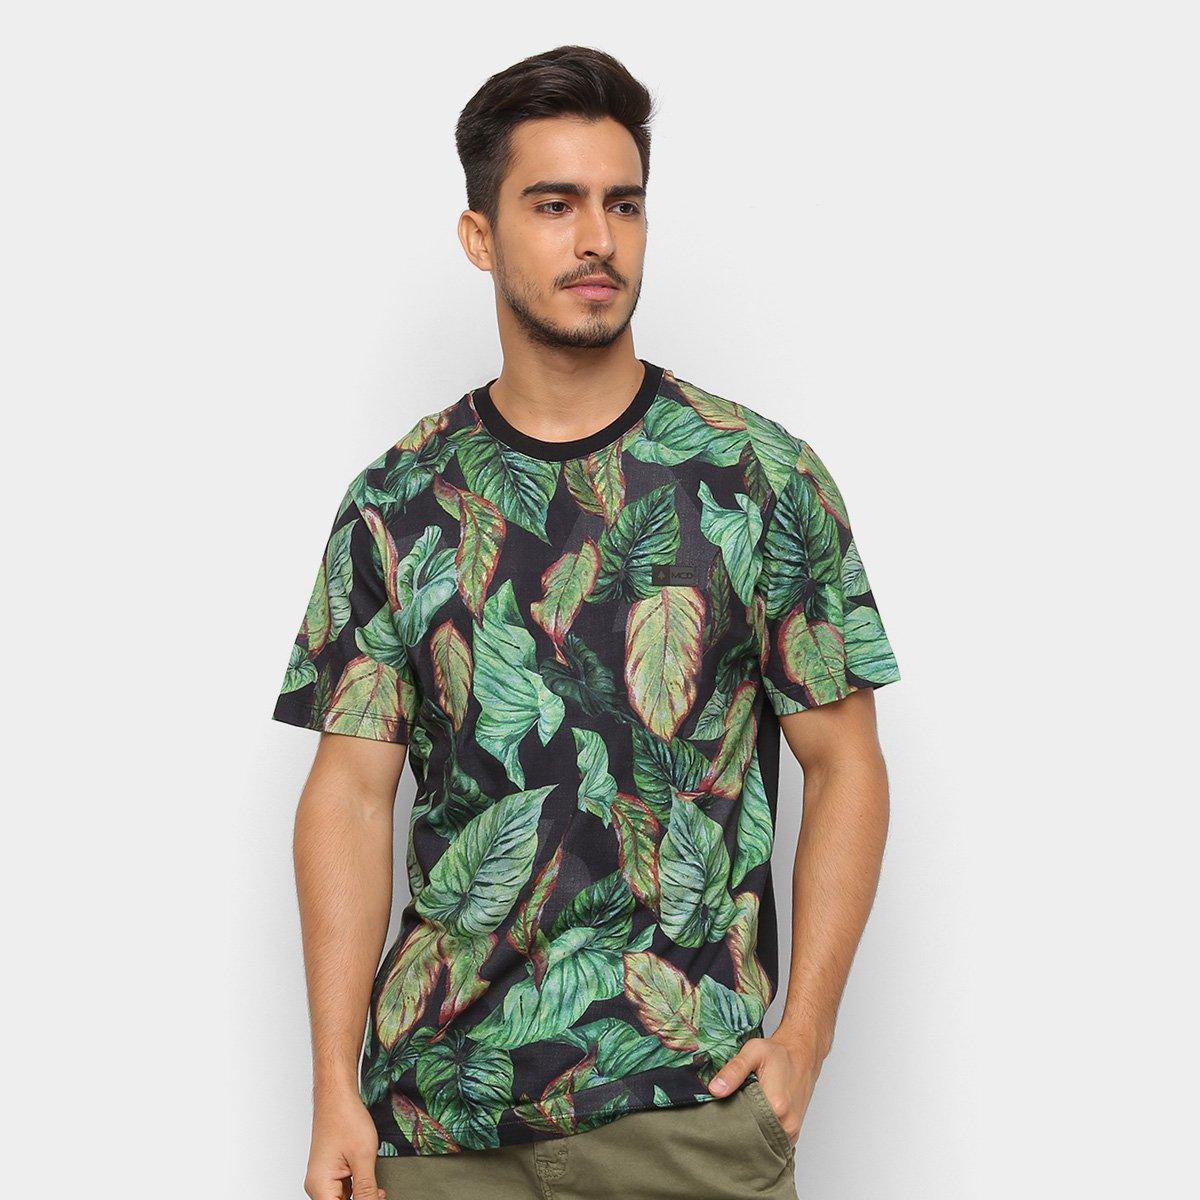 Camiseta MCD Especial Full Atlantic Forest Masculina - Preto - Compre Agora   5f0c93f9077